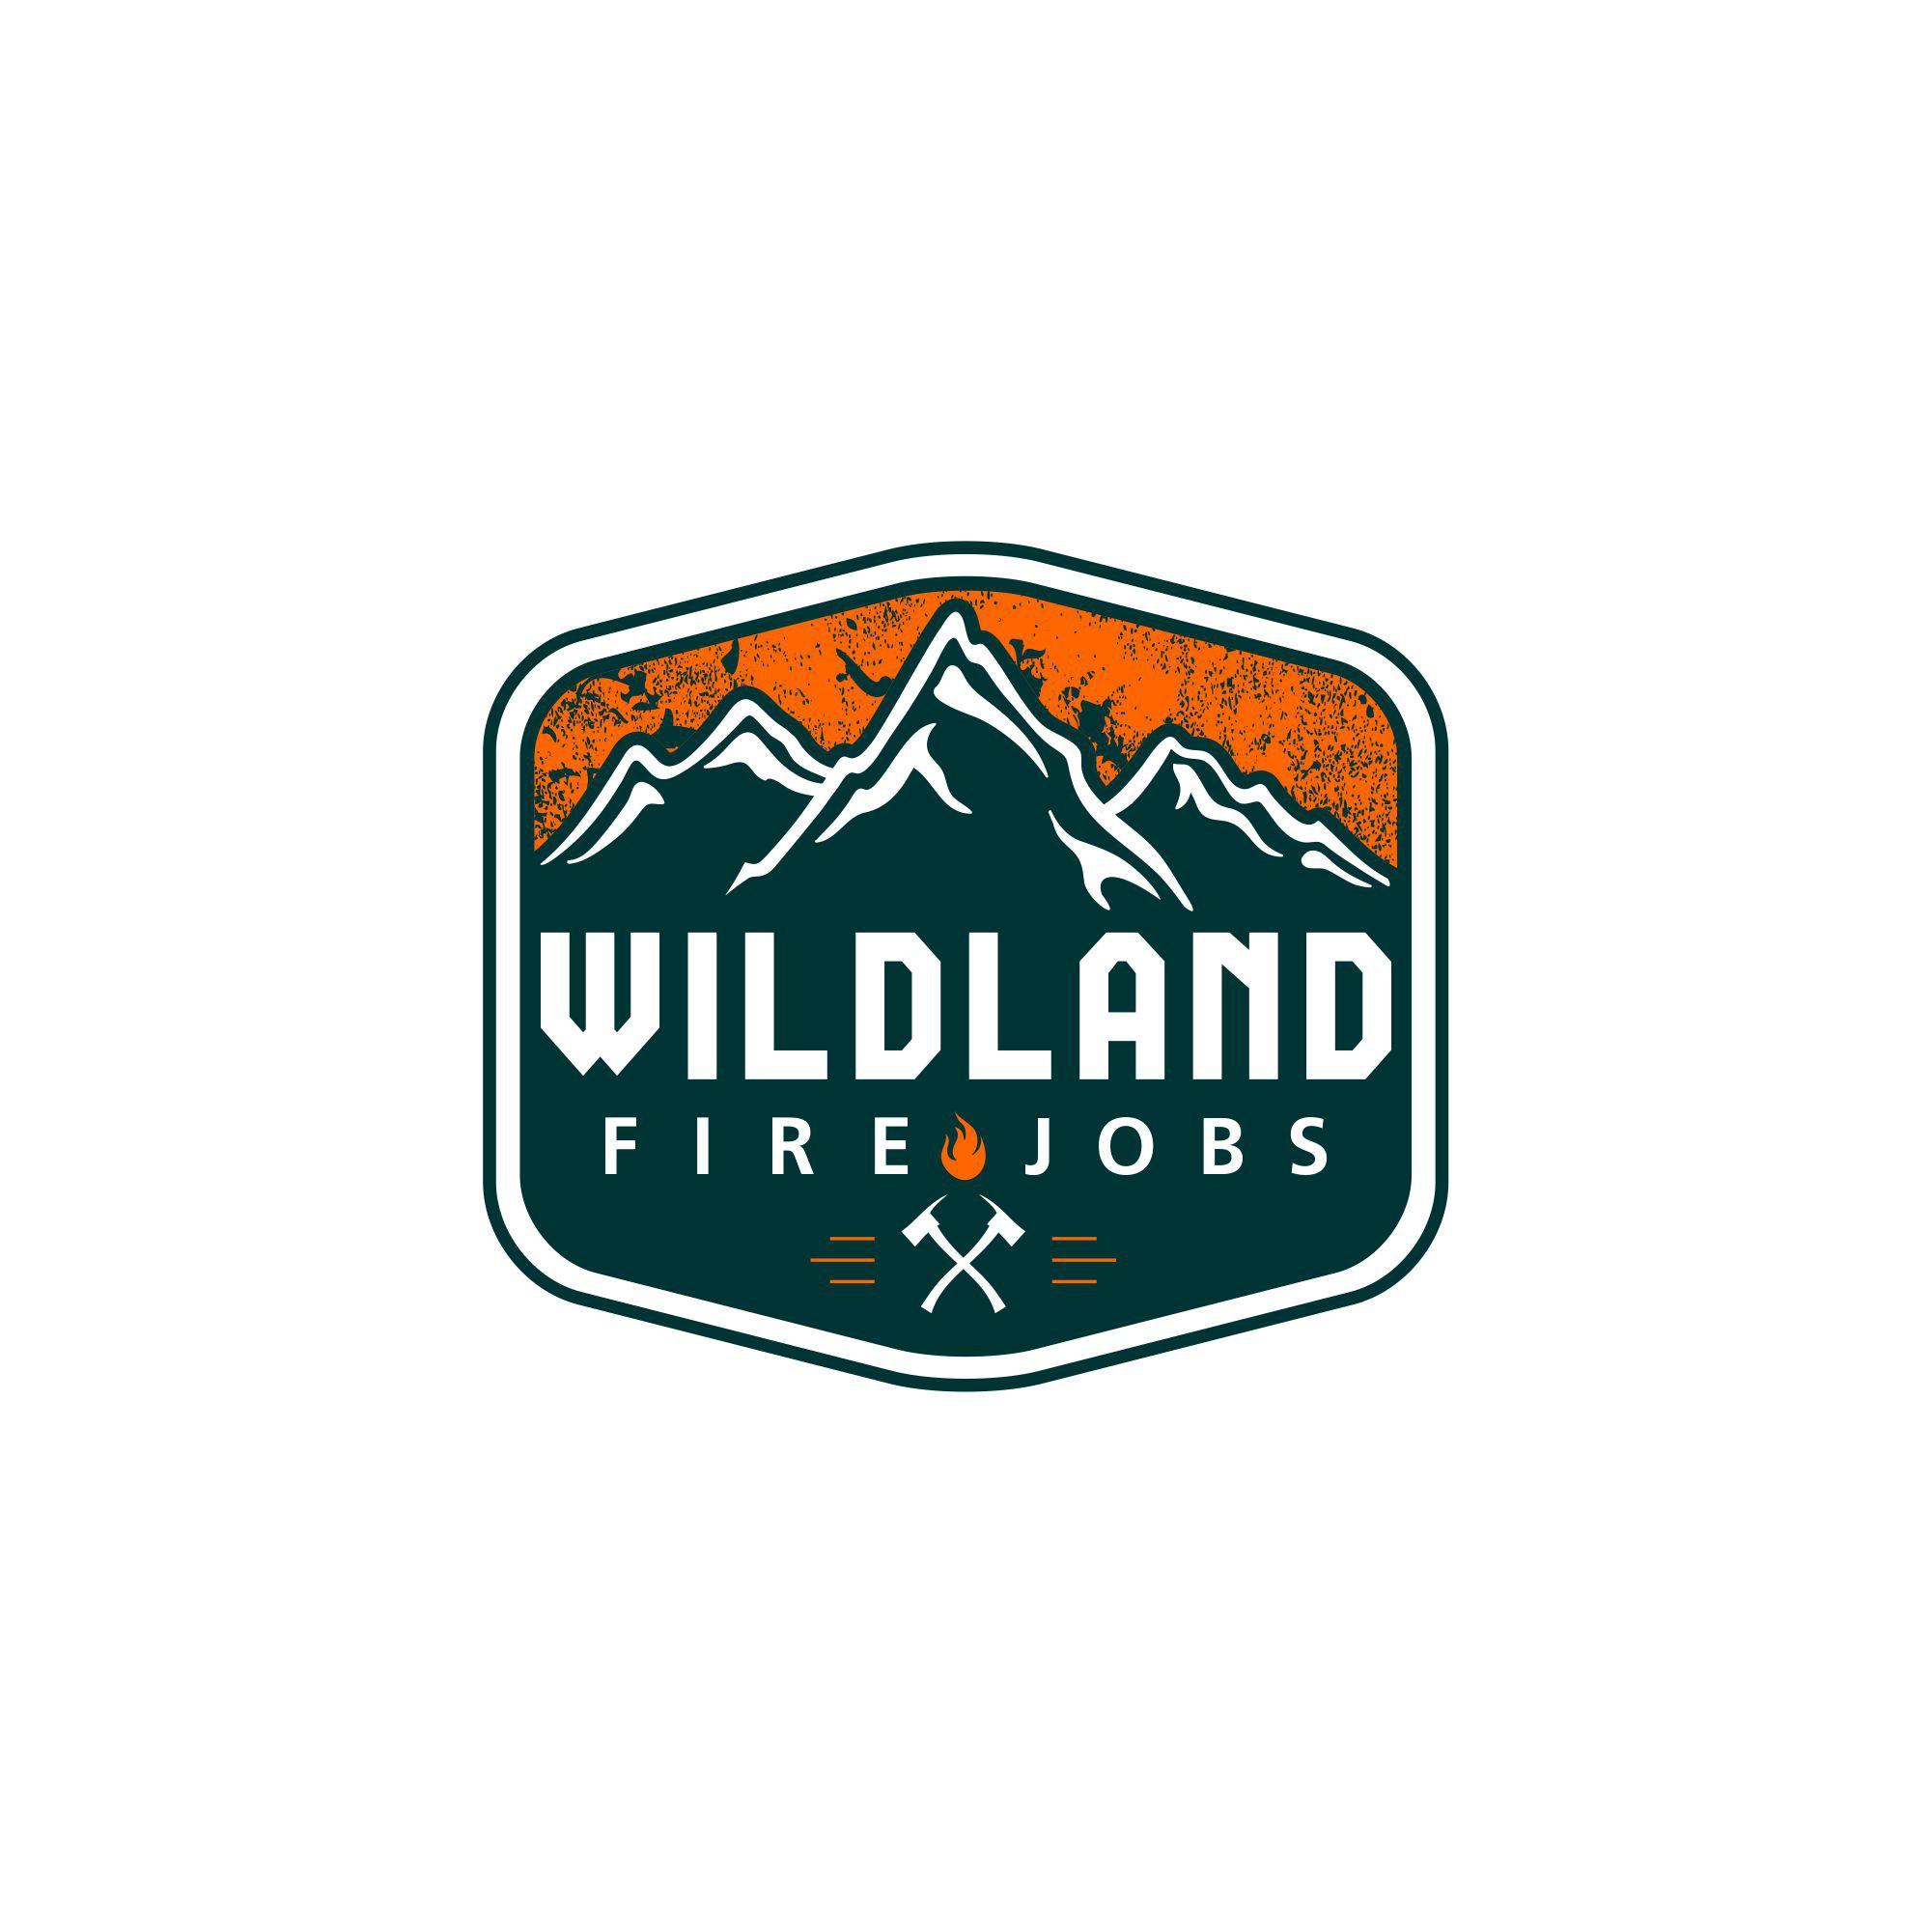 Only YOU Can Create a Logo for WildlandFireJobs.com!